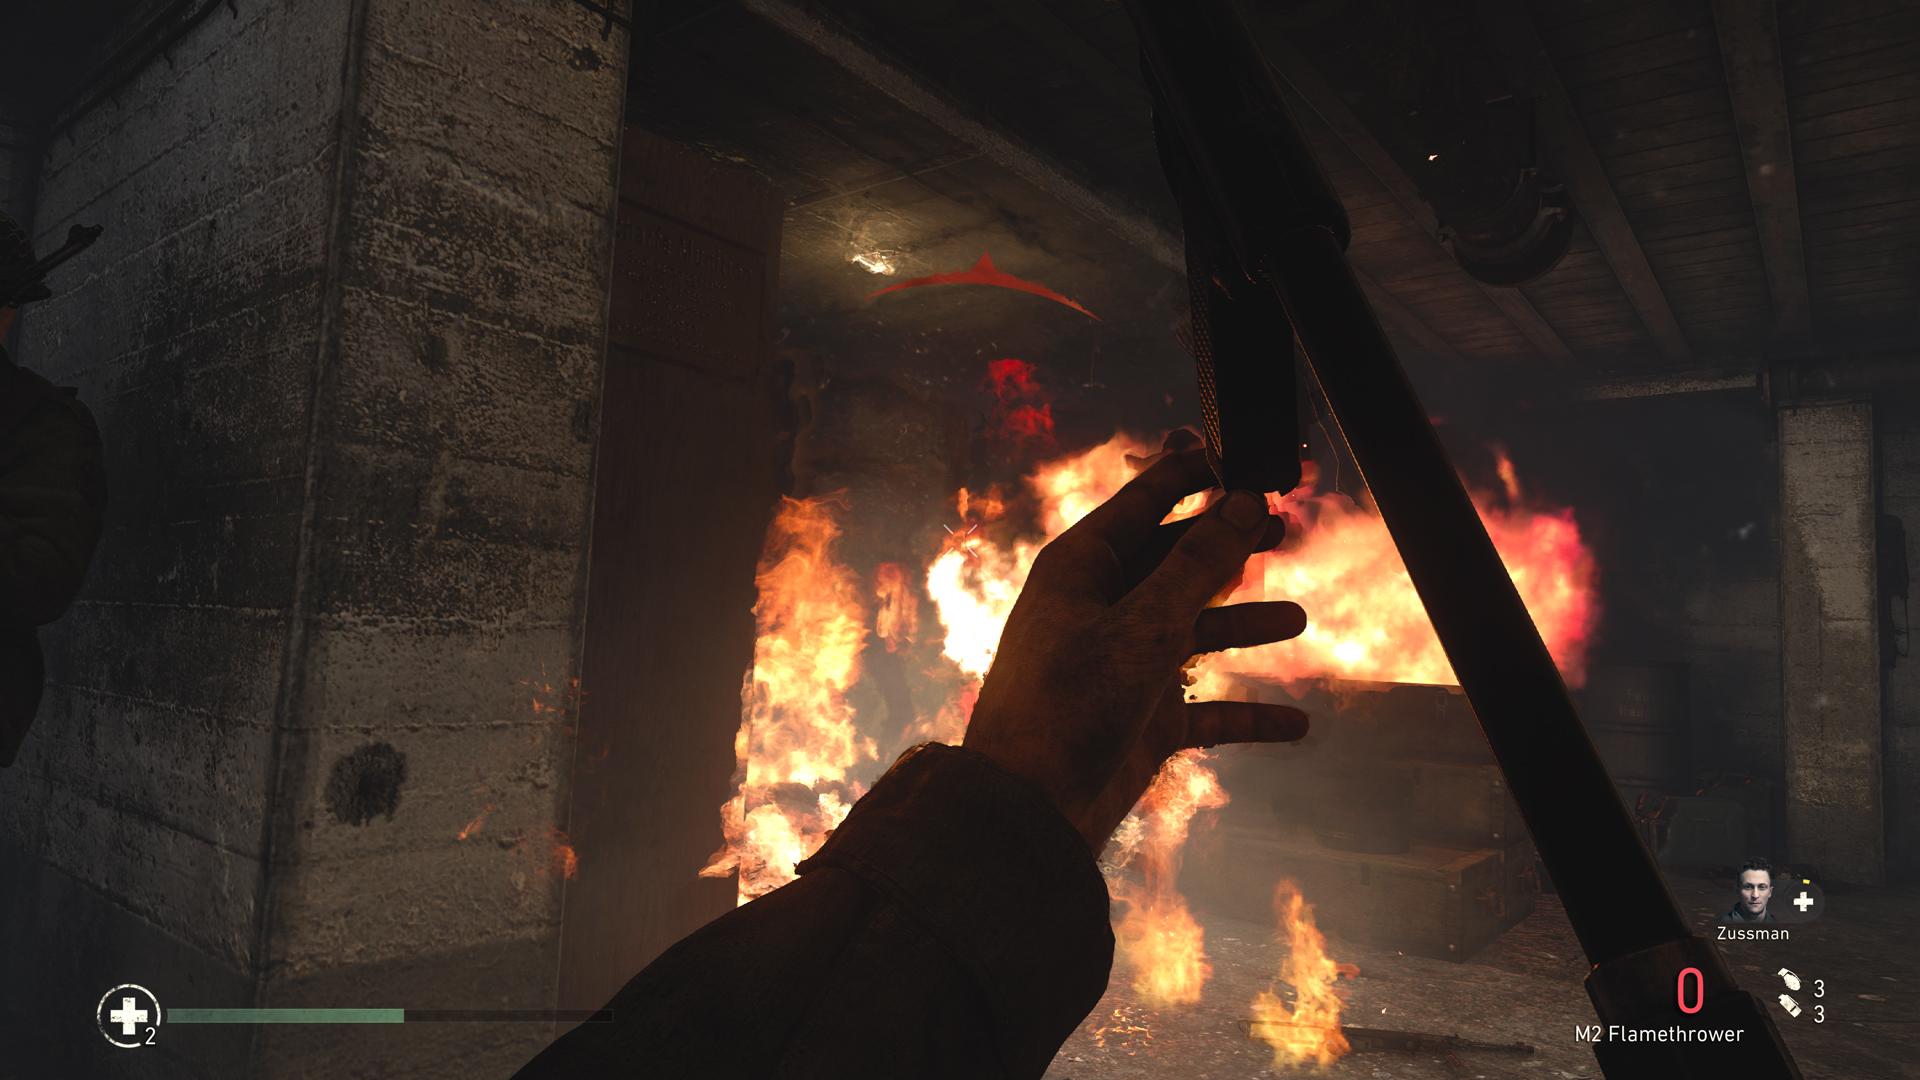 Call of Duty World War II Xbox One x flamethrower